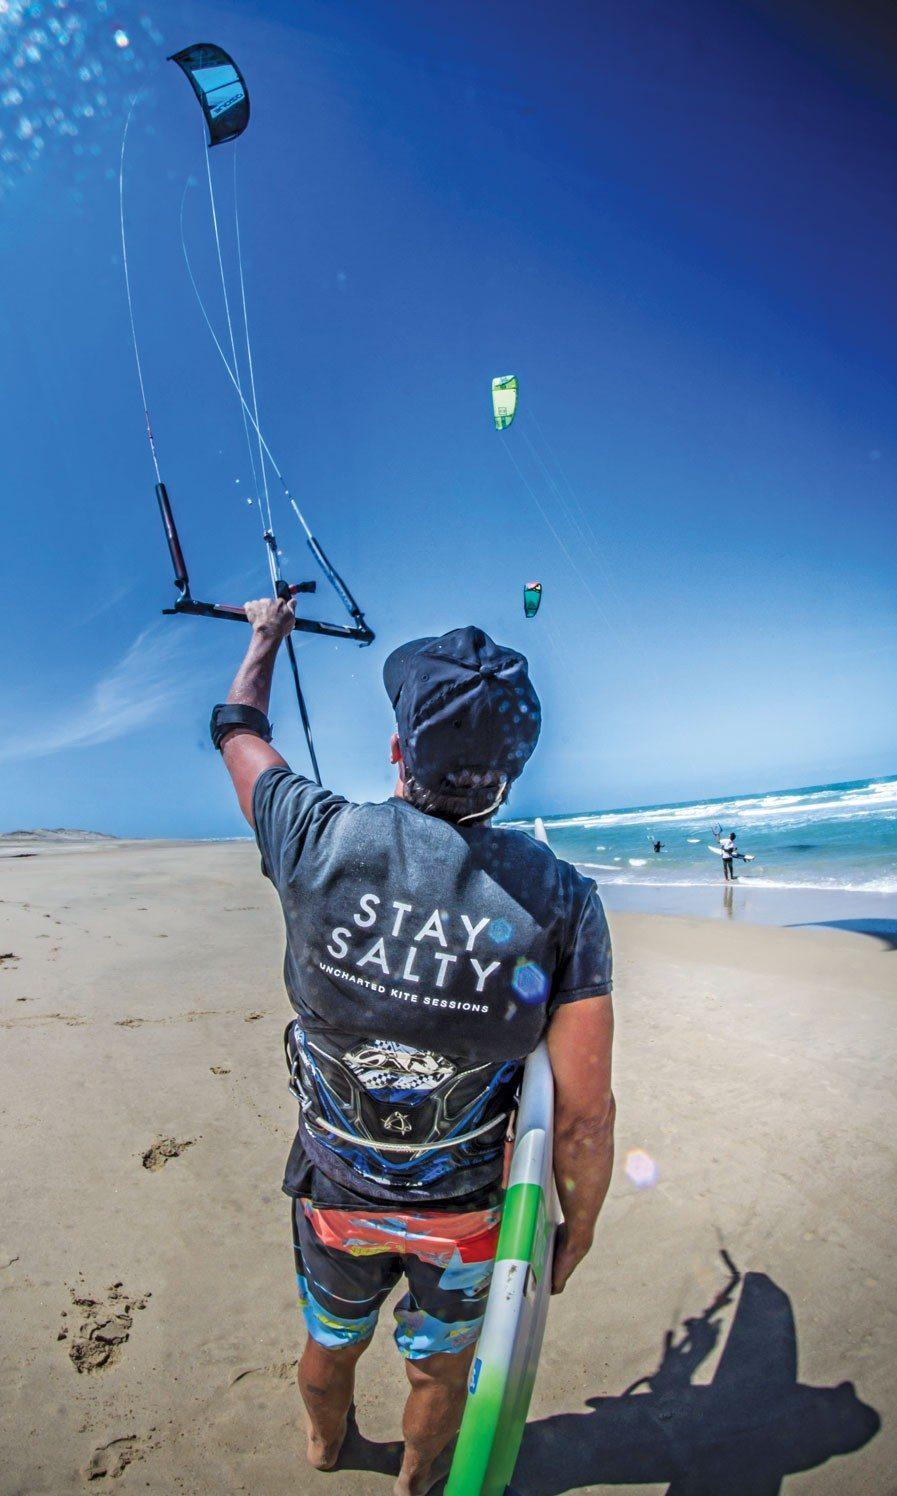 Cabarete Kite-surfing Pro Series 2016: Photo: Bruna Arcangelo de Toledo